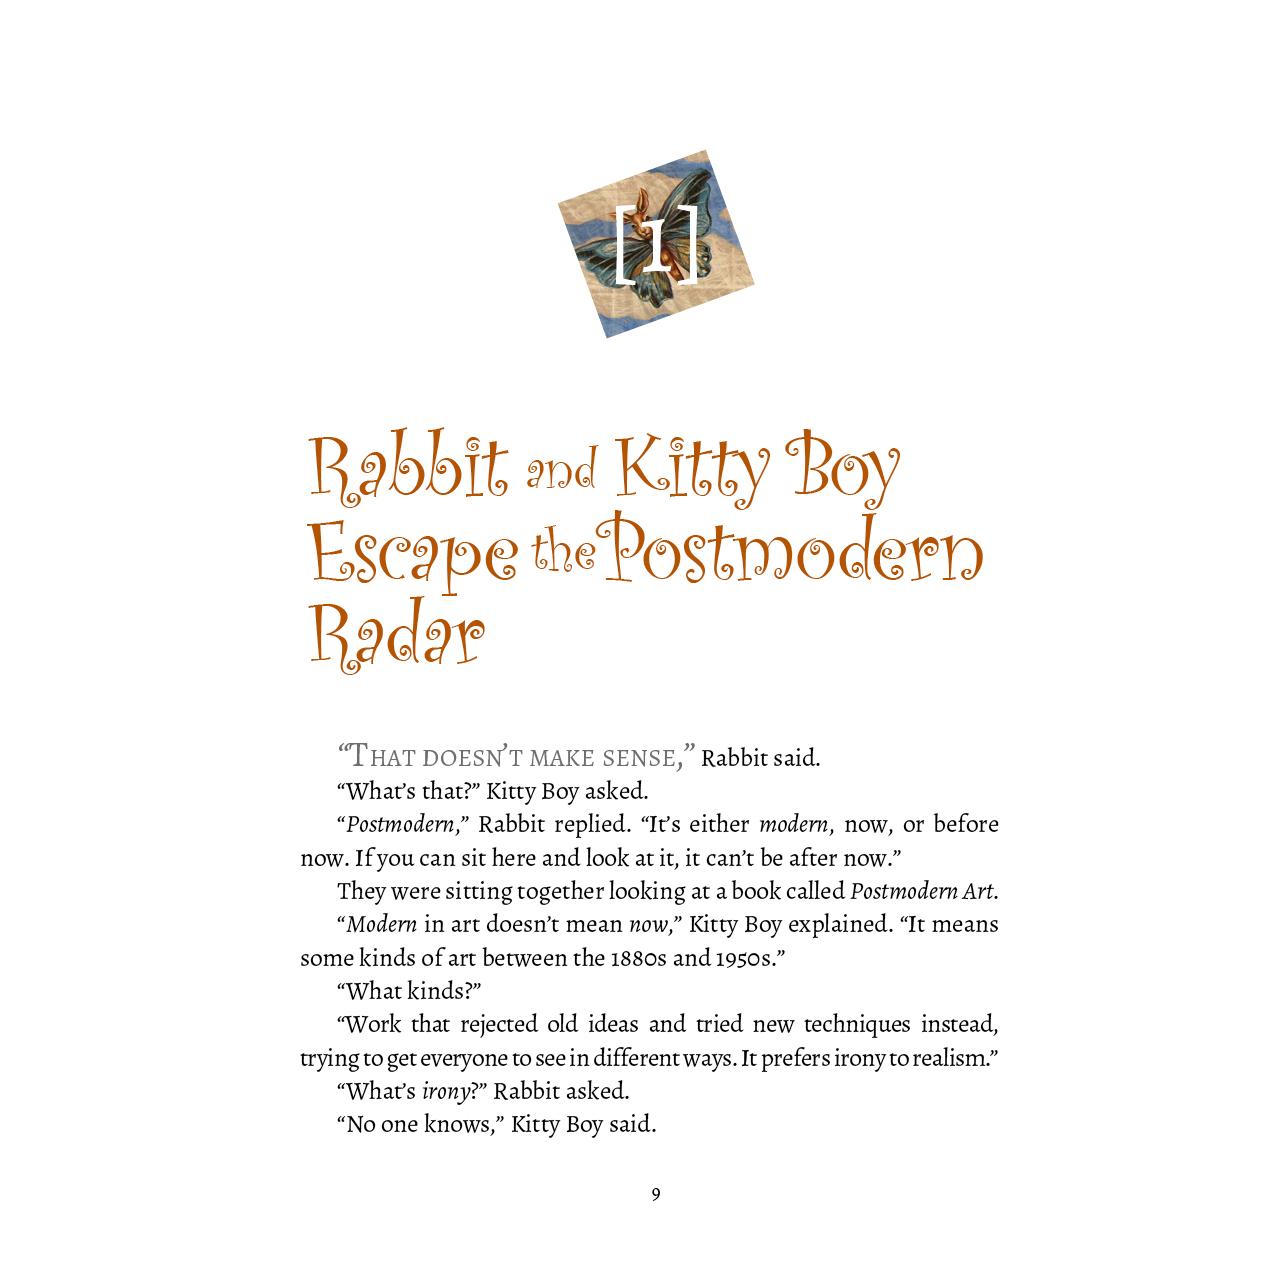 R&KB4-279